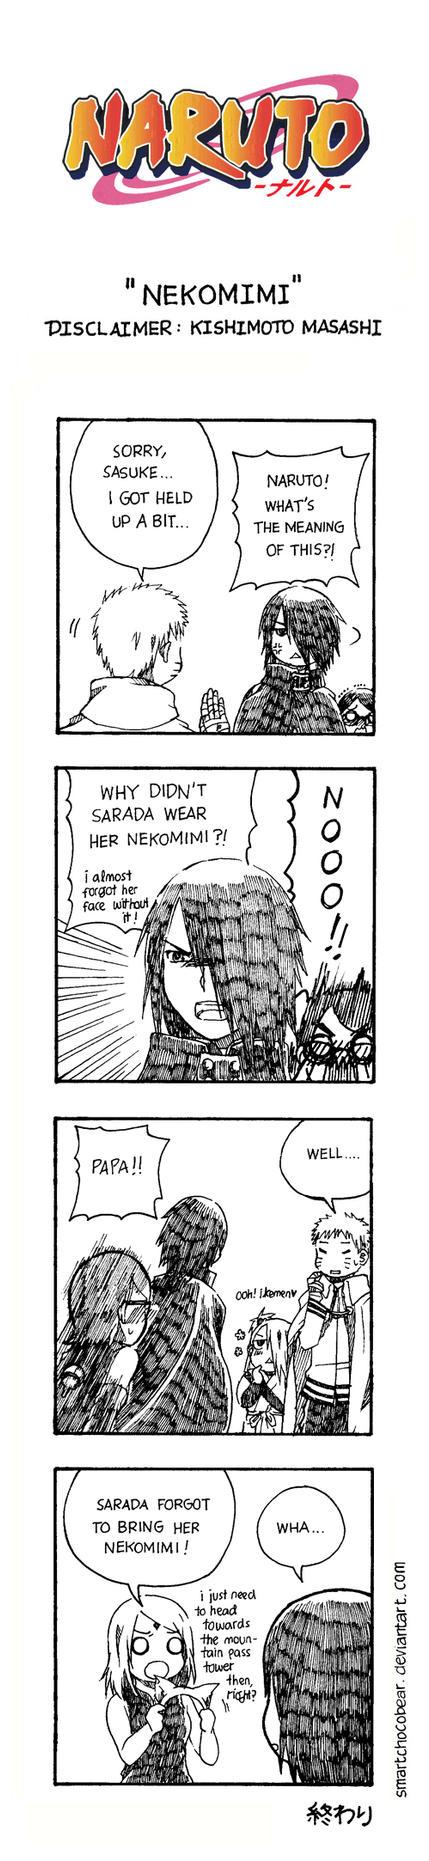 Naruto Doujinshi - Nekomimi by SmartChocoBear